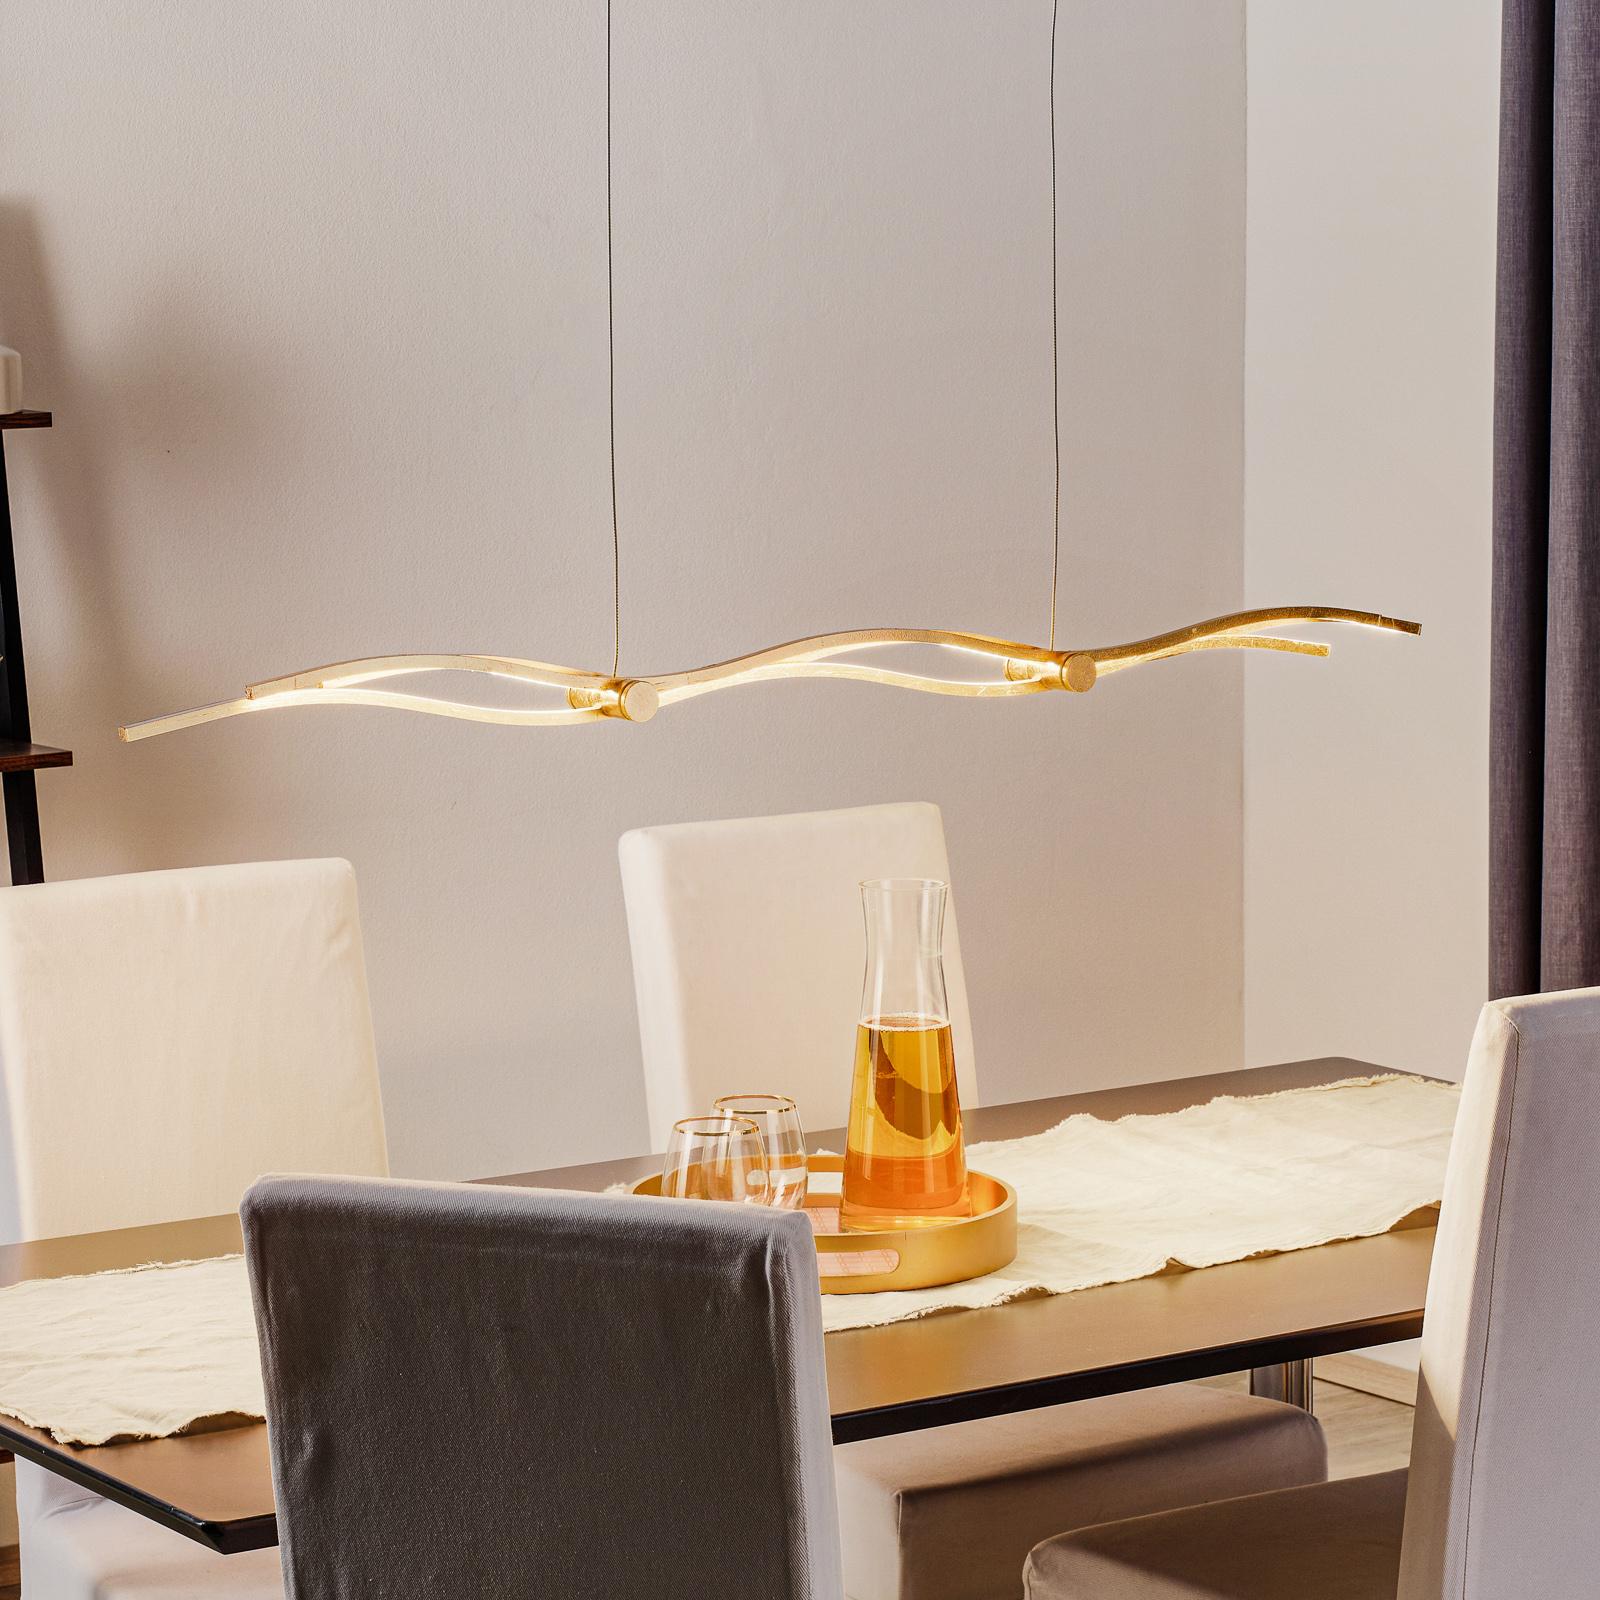 Suspension LED Silk feuilles d'or 120cm